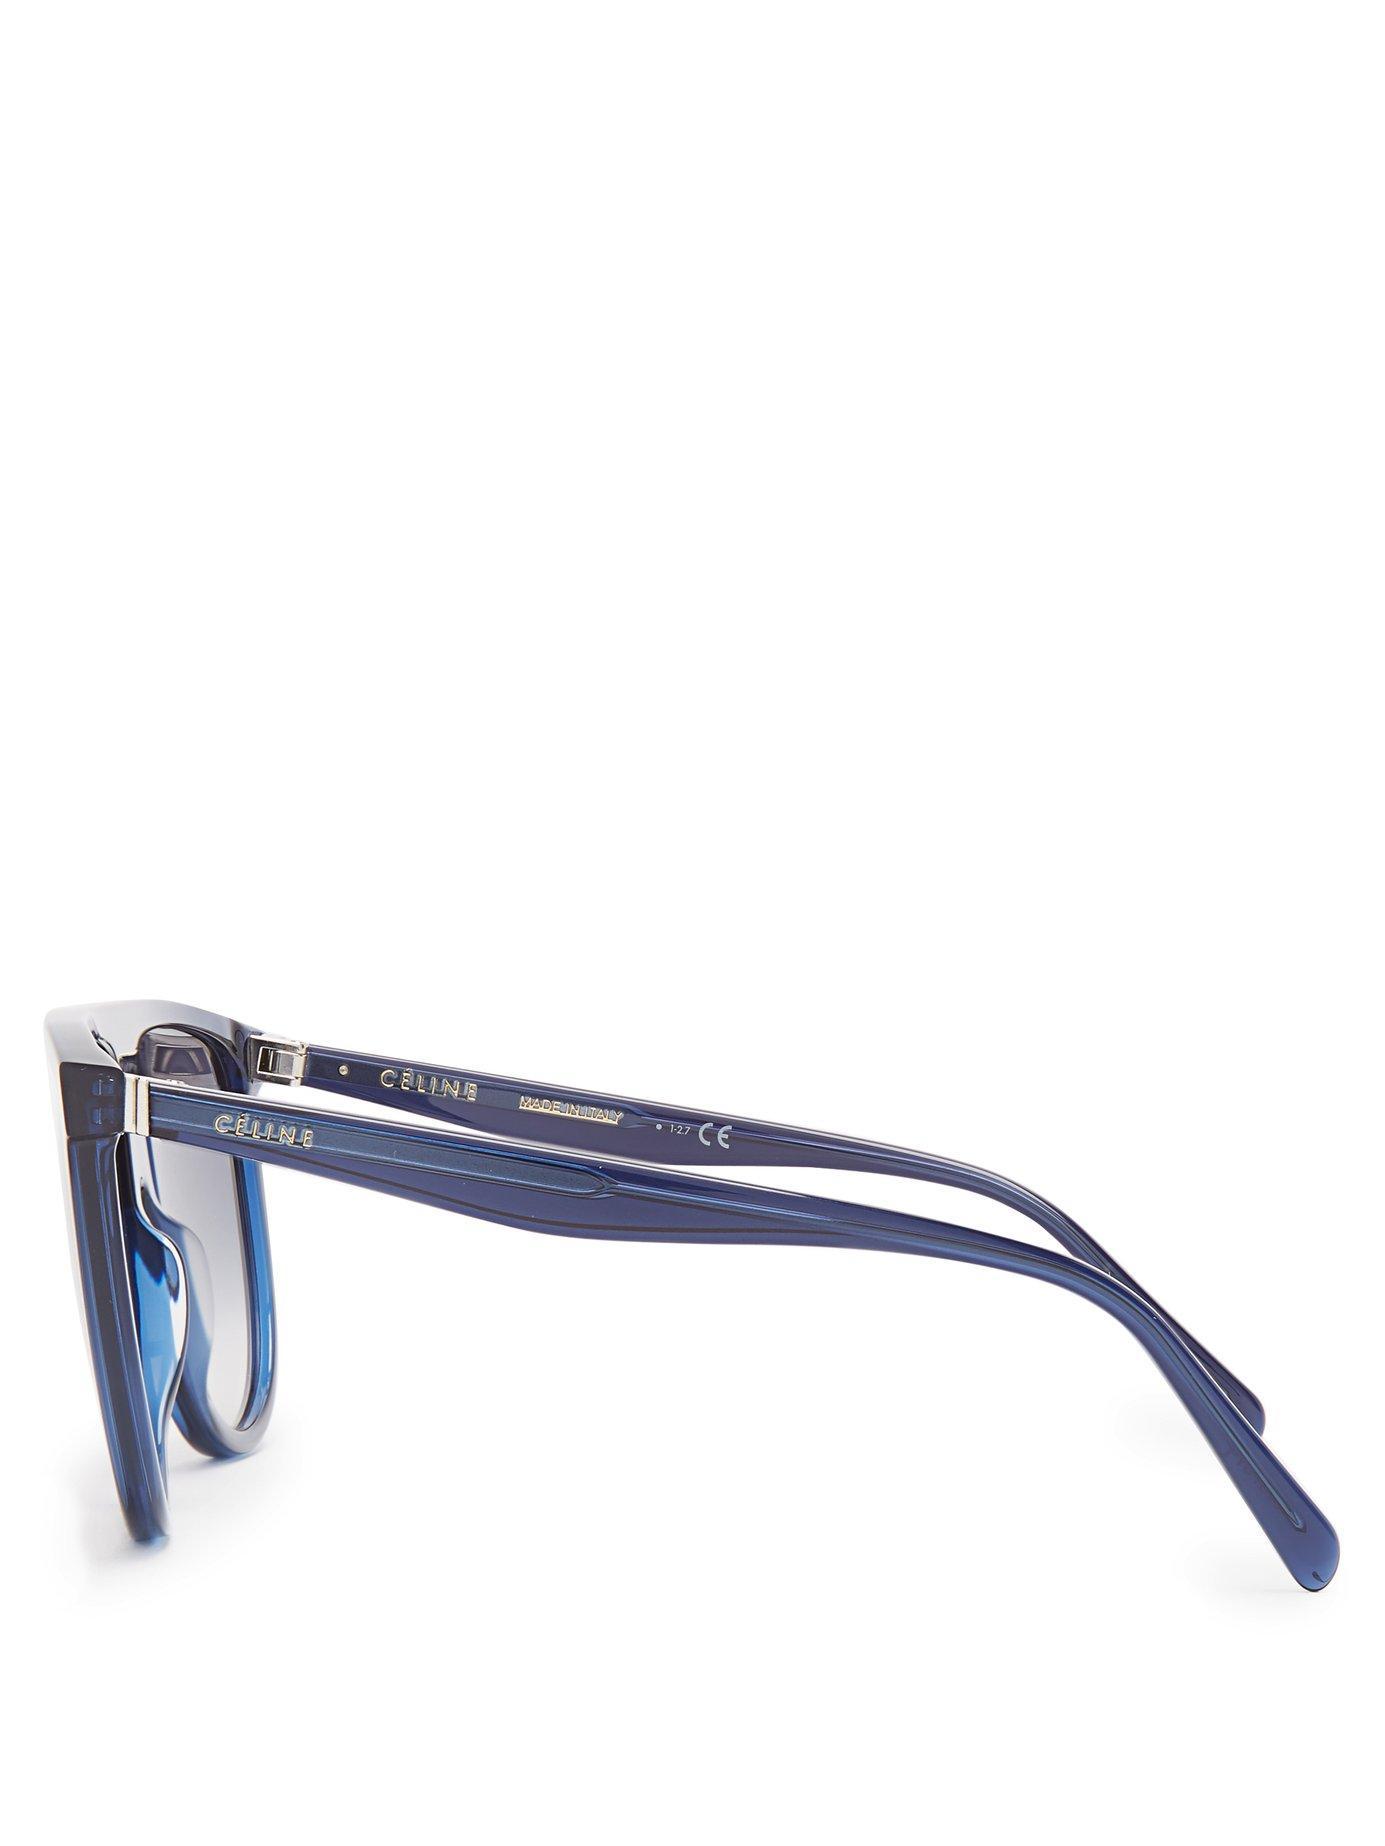 5825b84f3a Céline - Blue Shadow D Frame Aviator Sunglasses - Lyst. View fullscreen